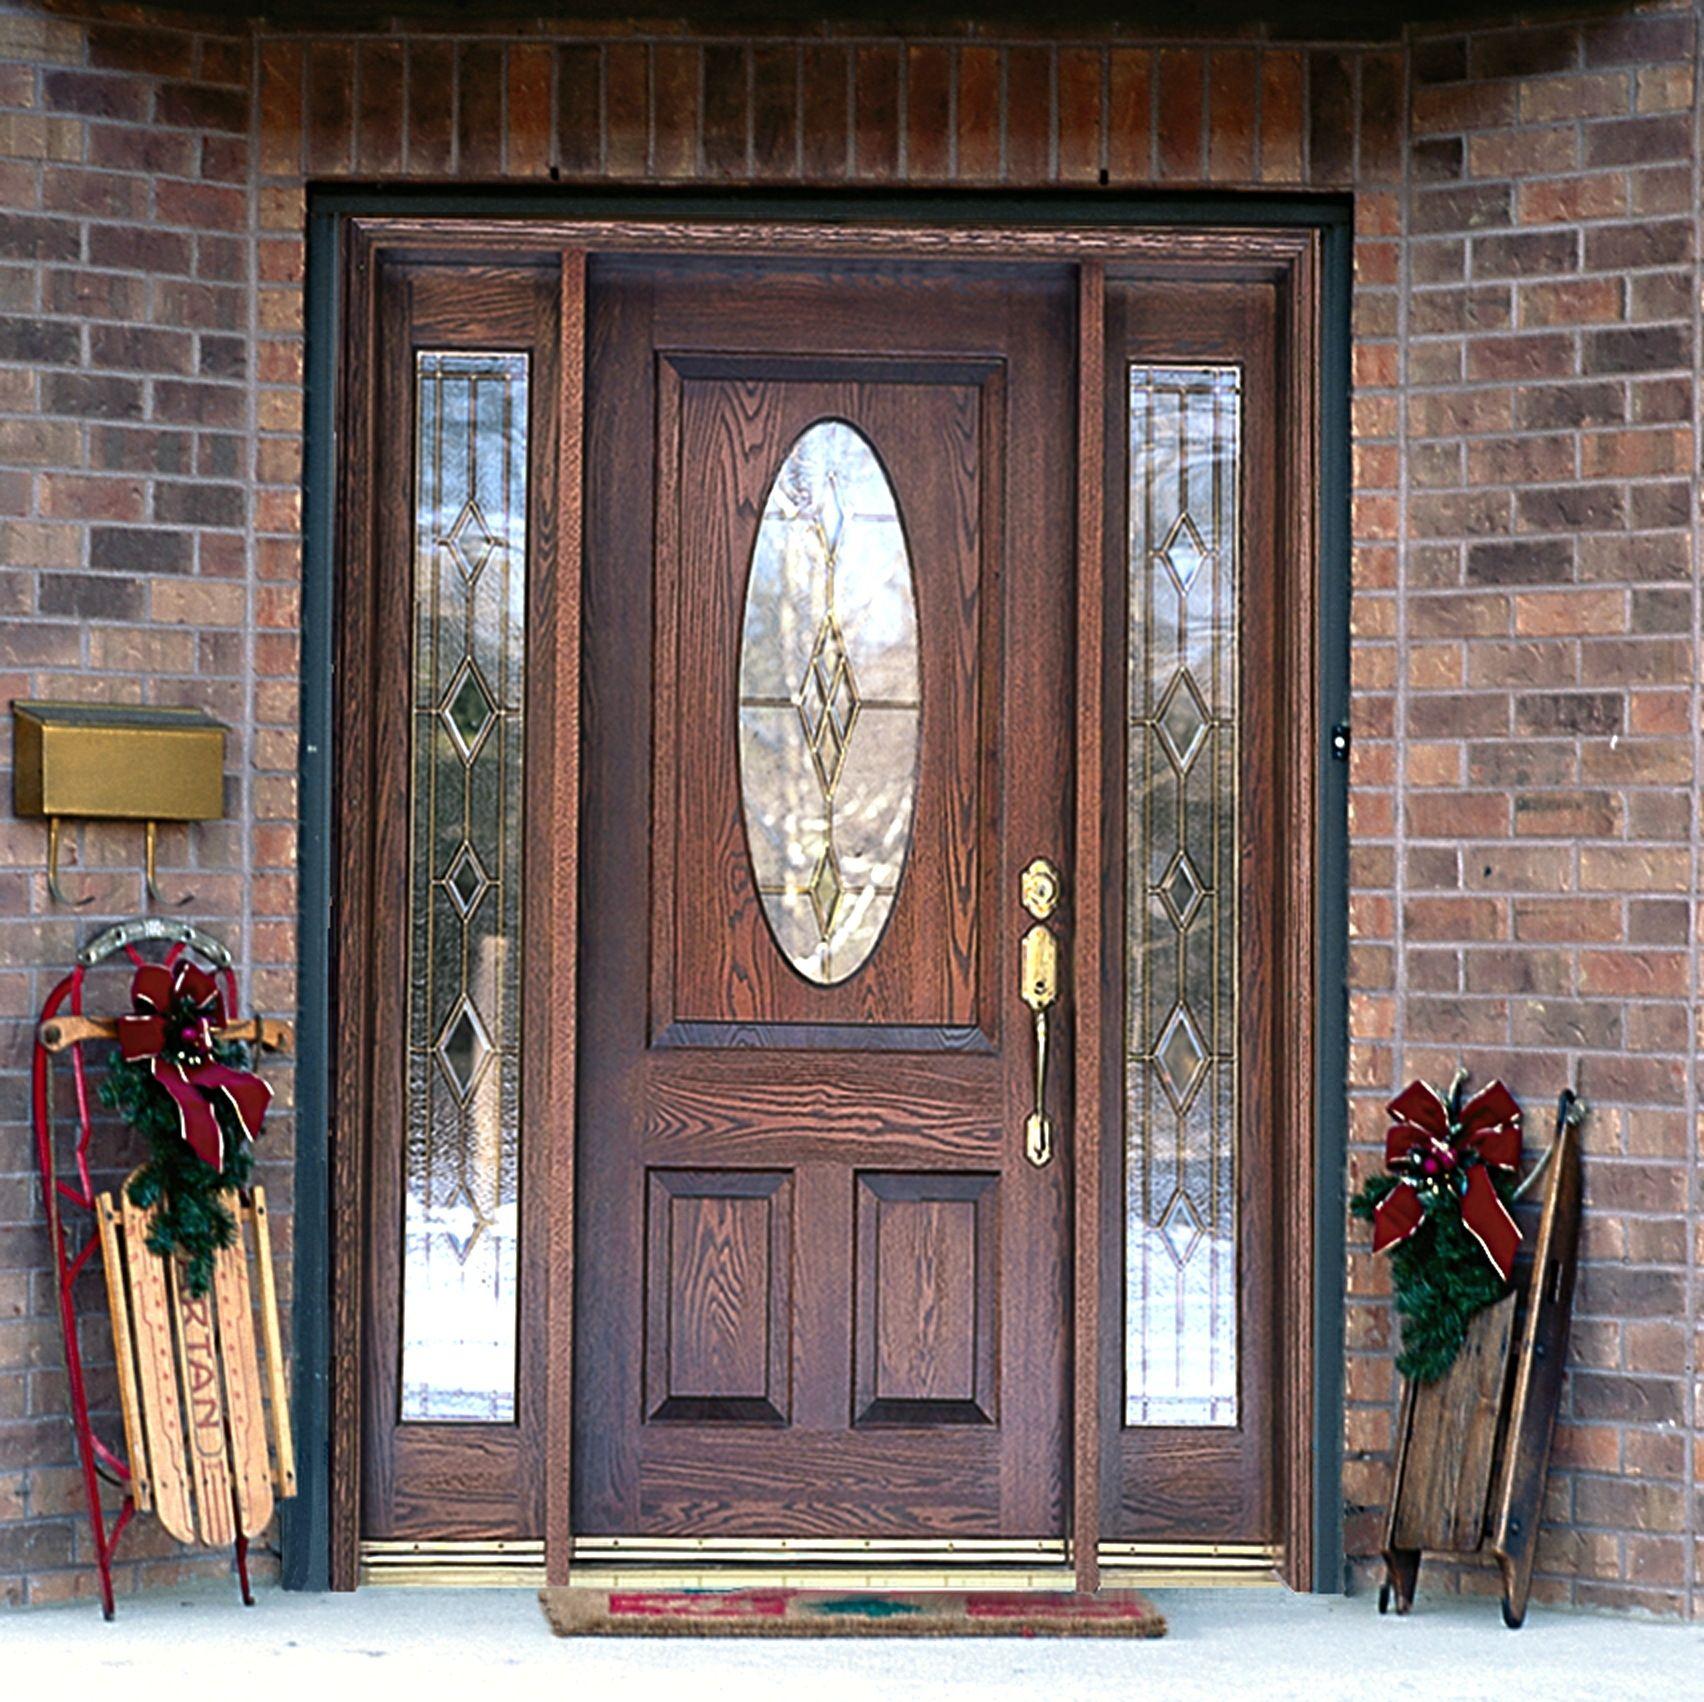 Exterior Wooden Doors With Glass Panels Httpthefallguyediting